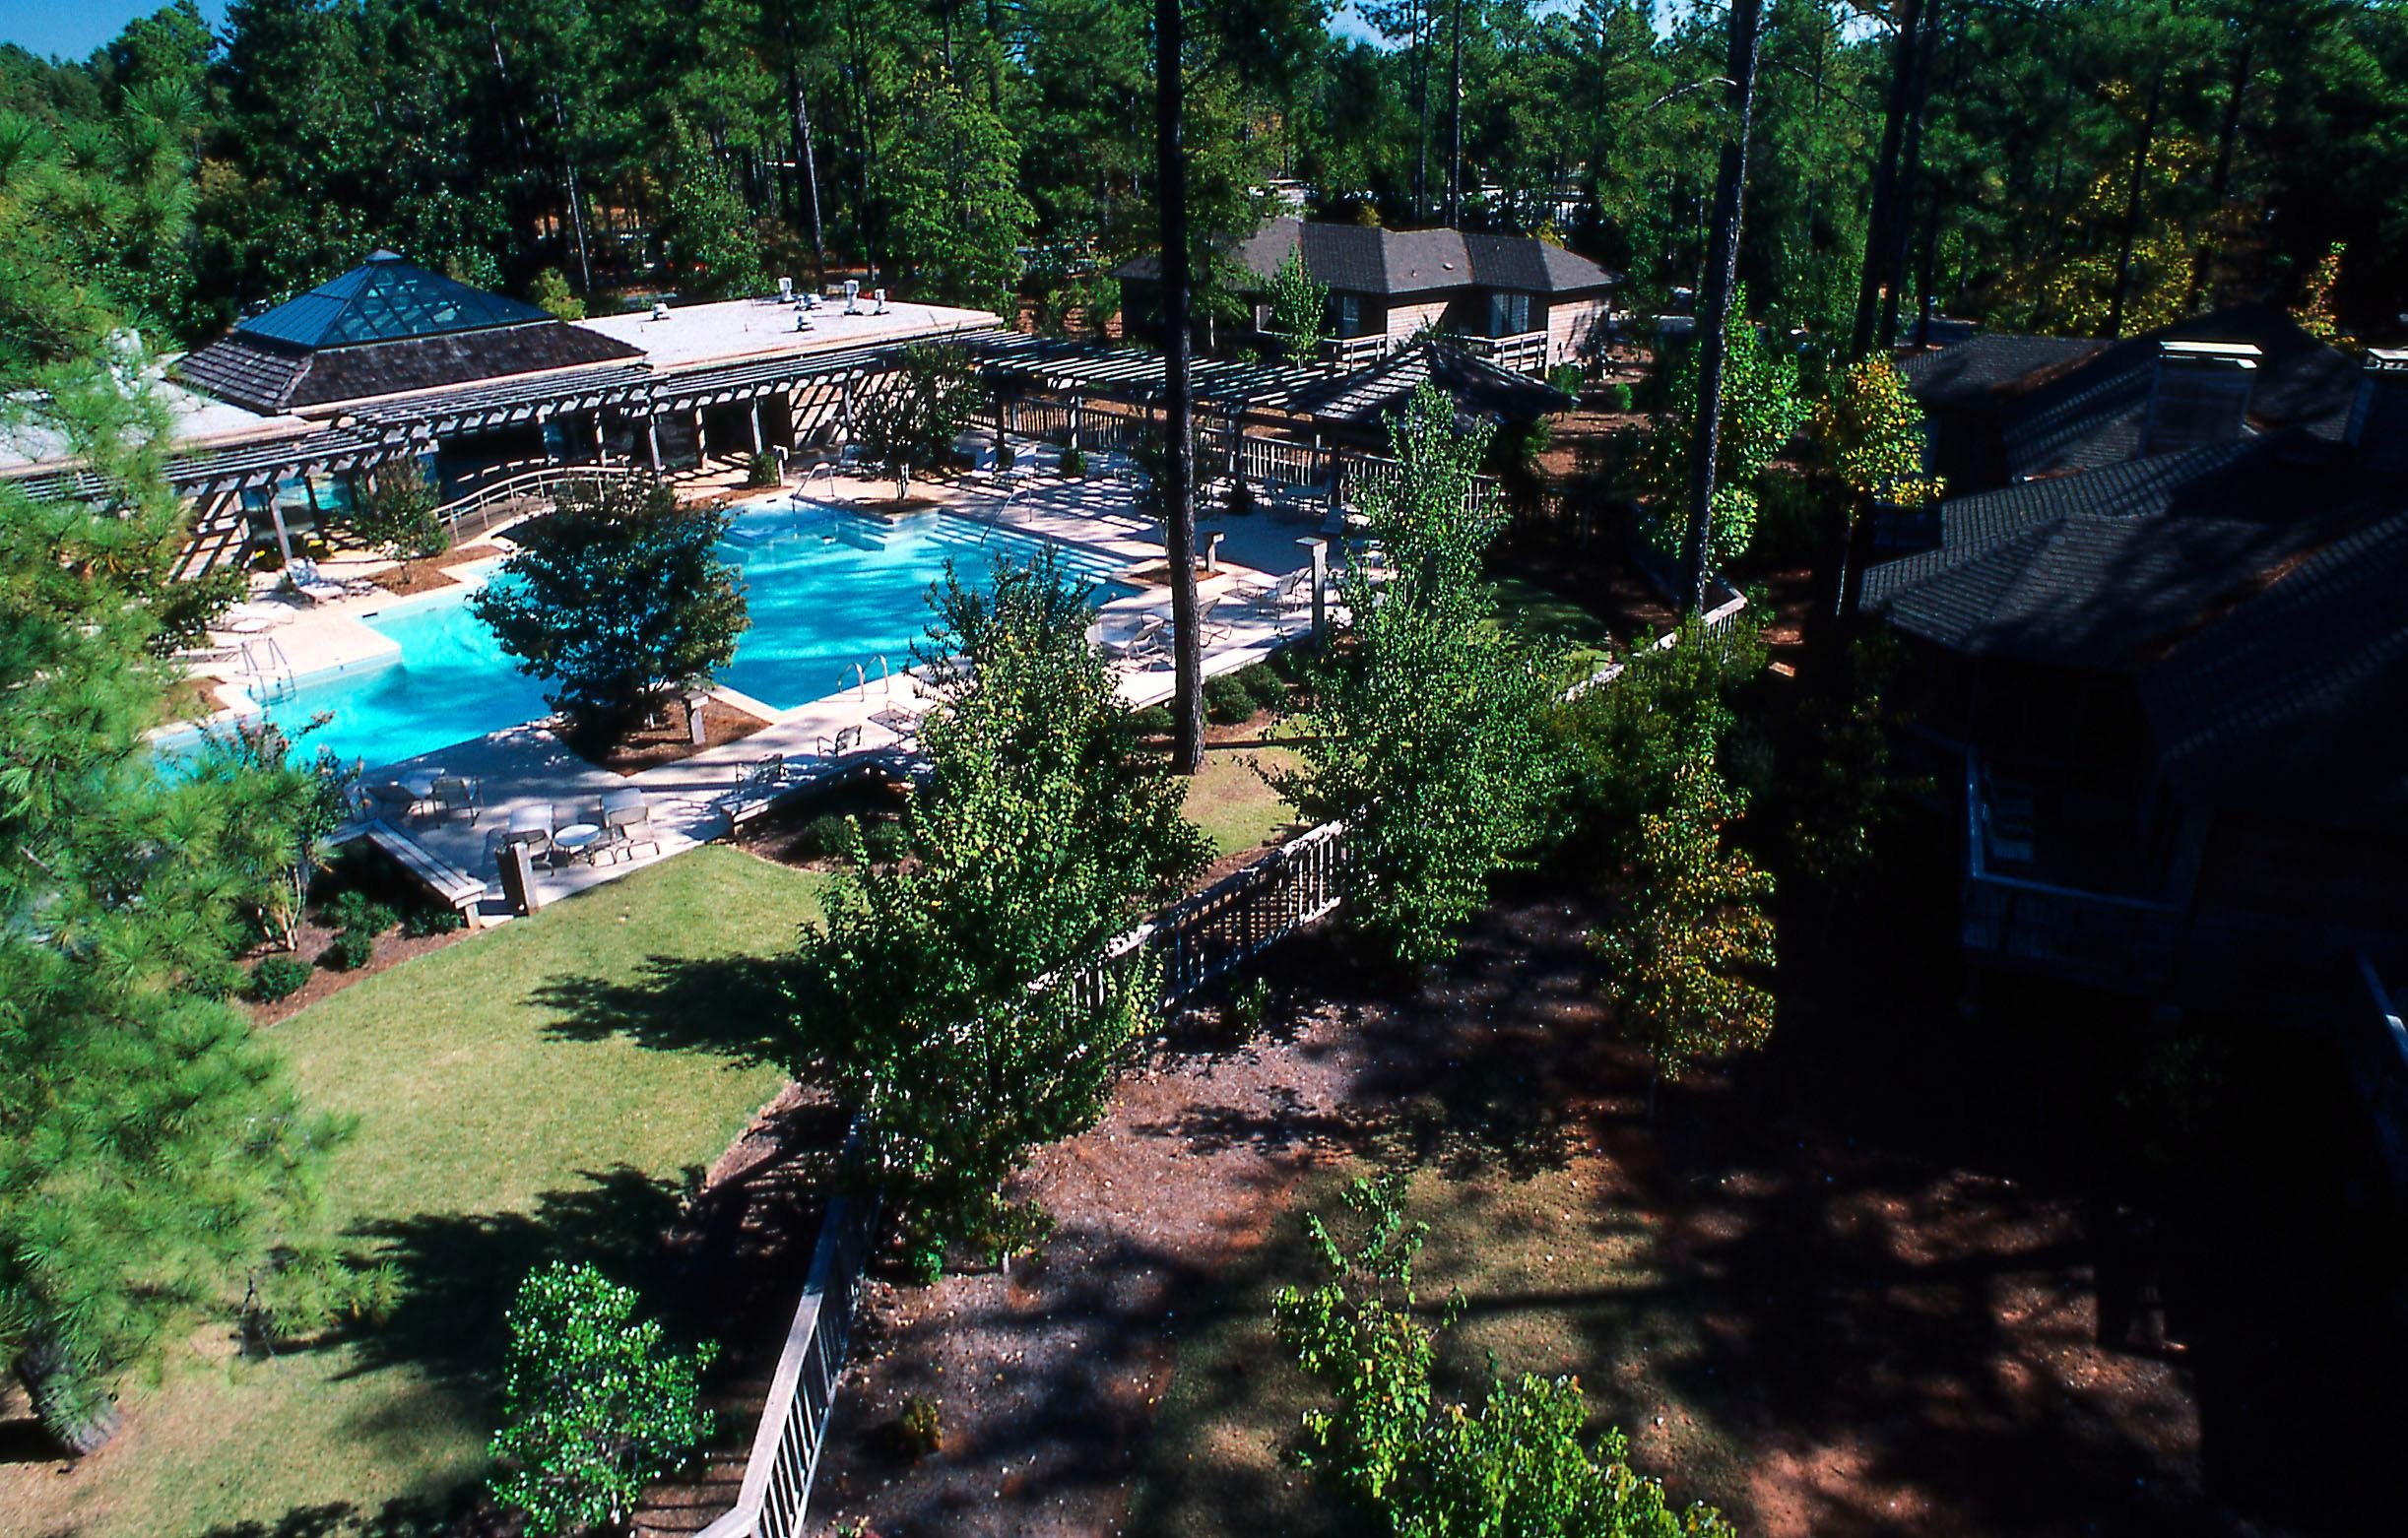 Callaway gardens hotels motels pine mountain georgia for Hotels near callaway gardens ga